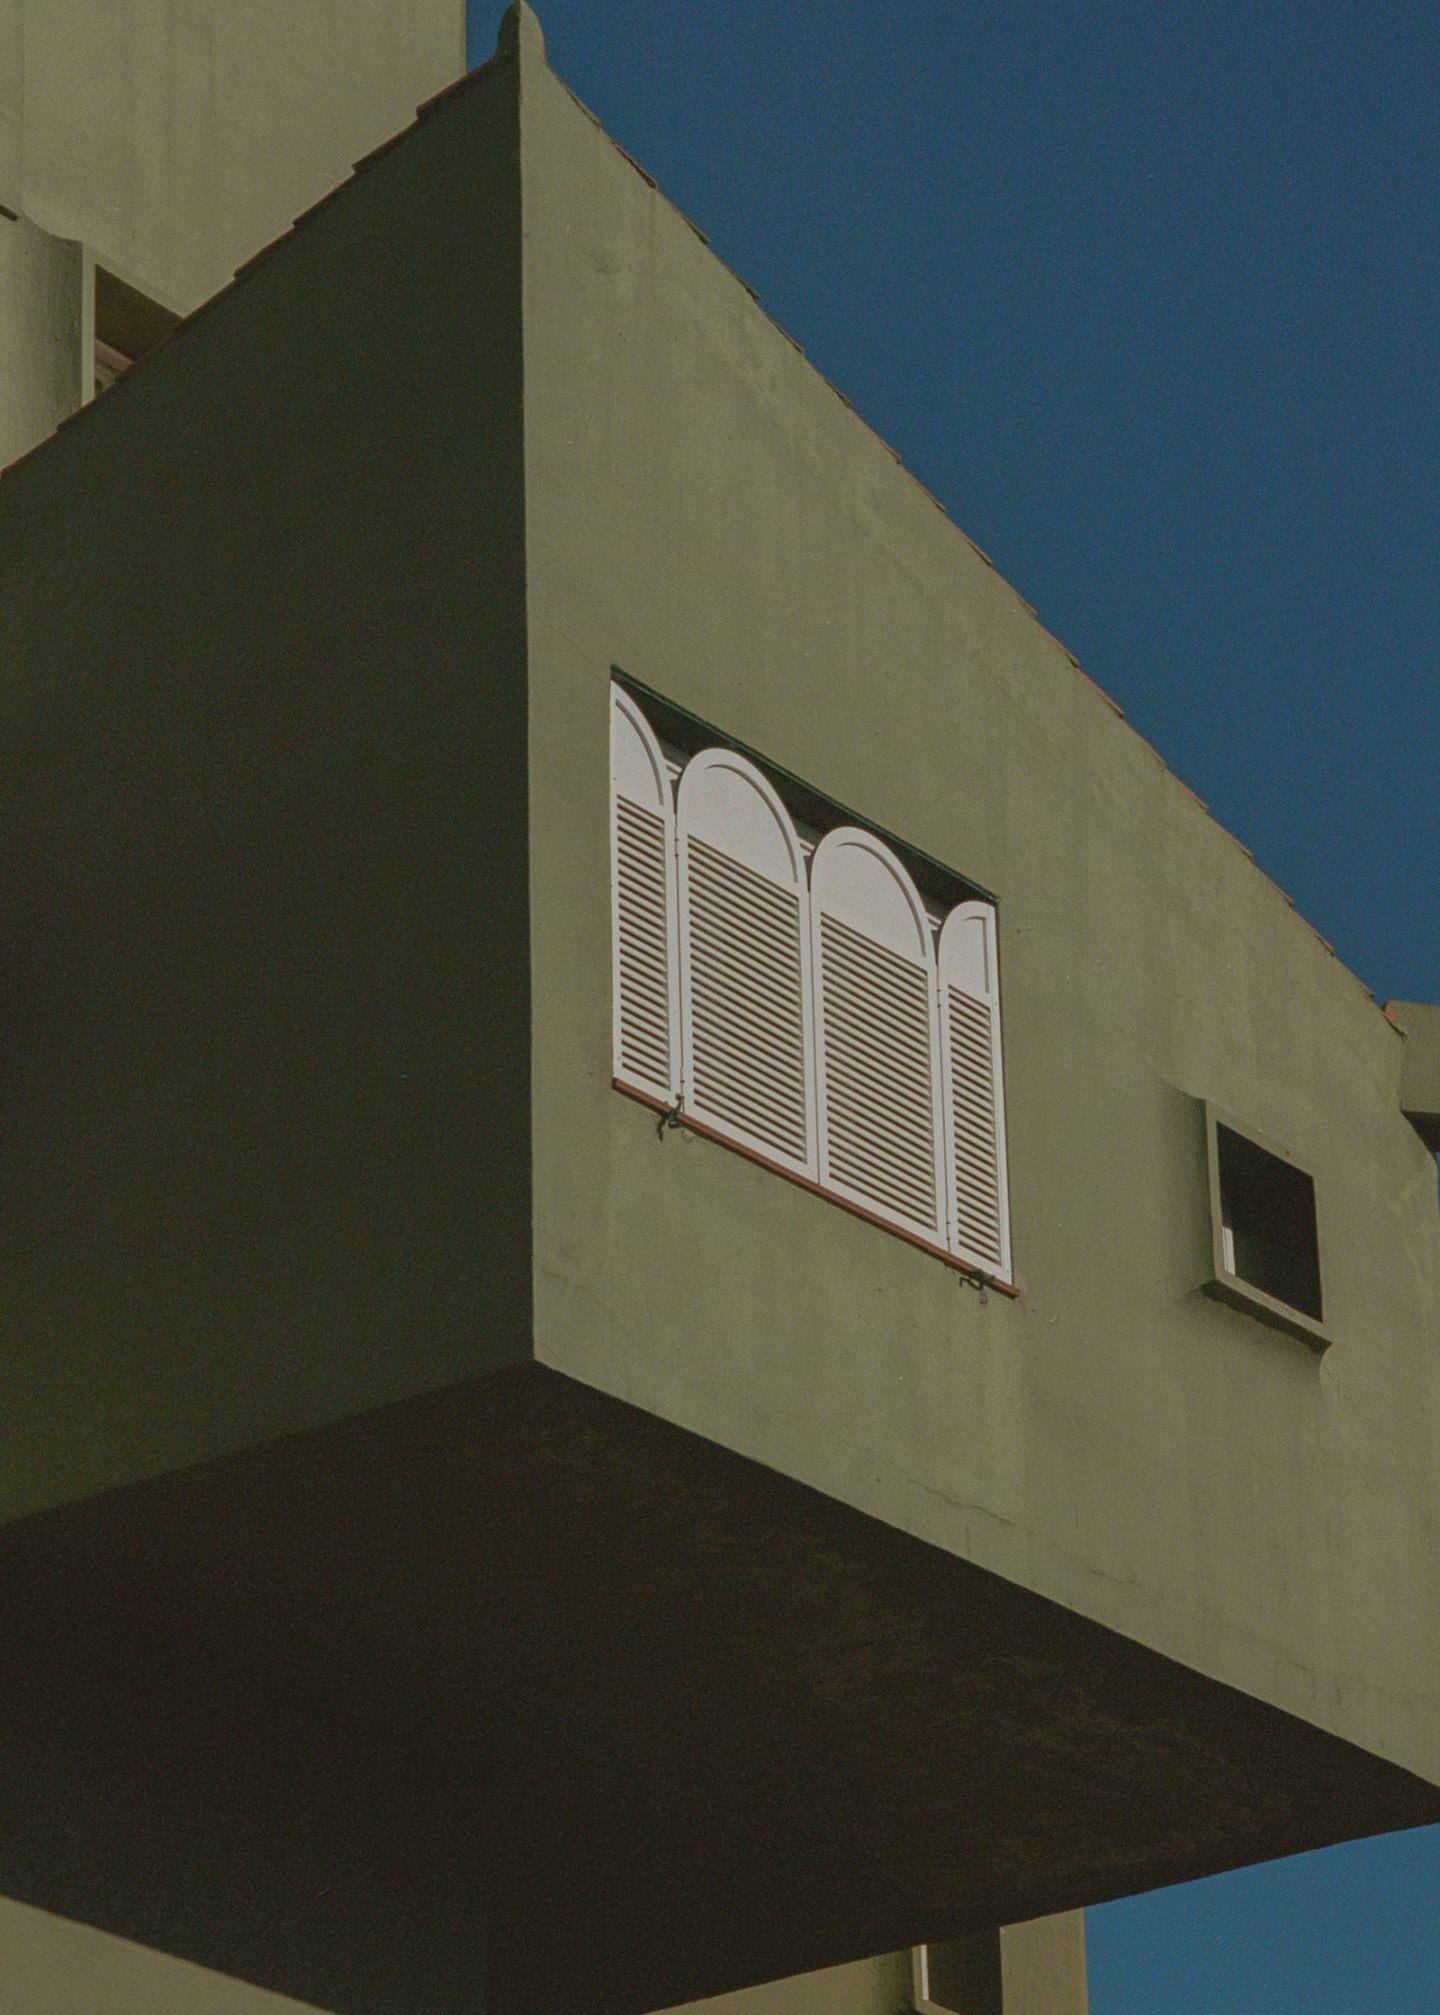 IGNANT-Photography-Austin-Leis-New-Horizon-013